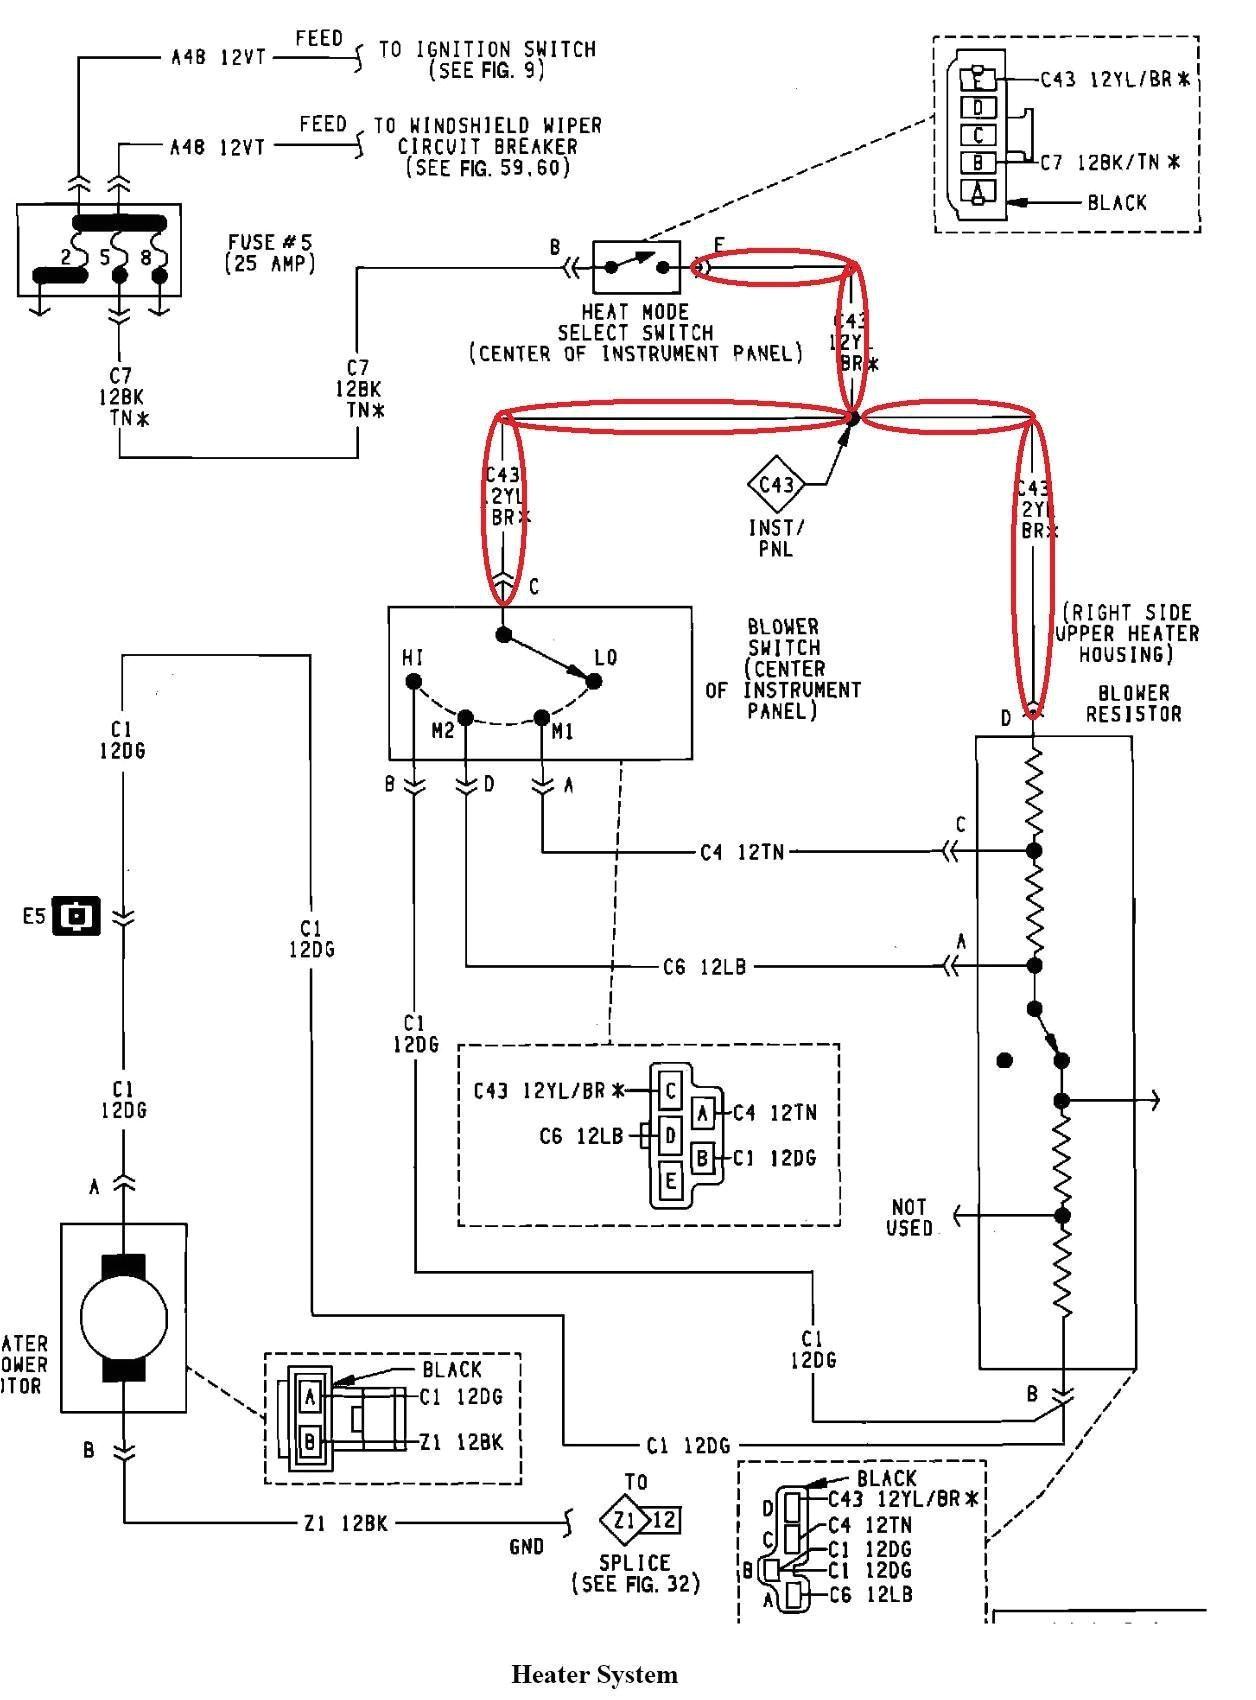 ez go battery diagram wiring diagram expert 1998 36 volt ez go golf cart wiring diagram 36 volt ezgo cart wiring diagram